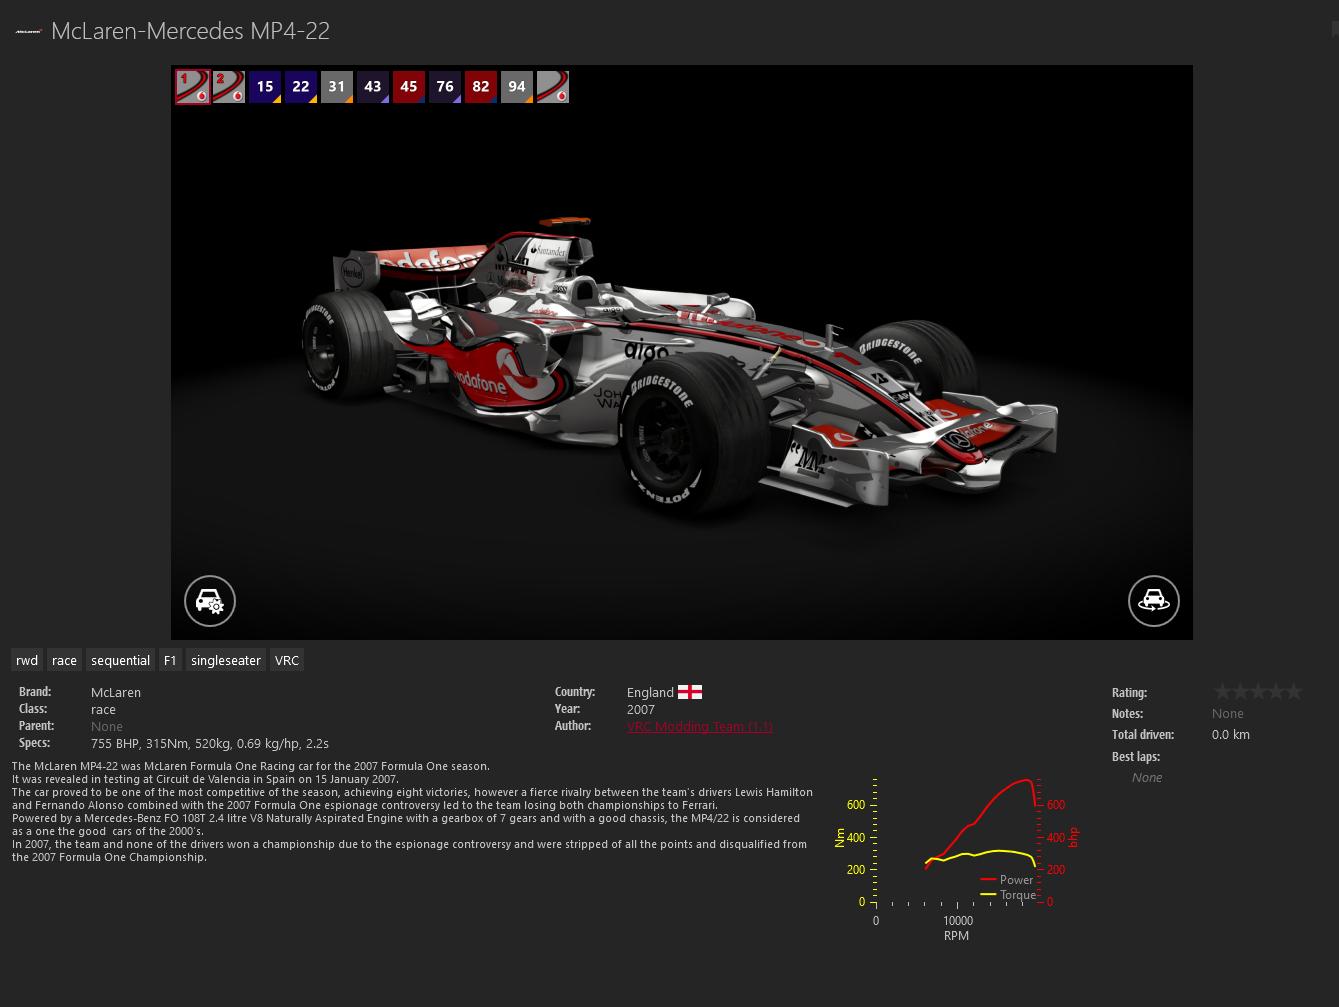 2021-03-17 19_36_01-McLaren-Mercedes MP4-22.png